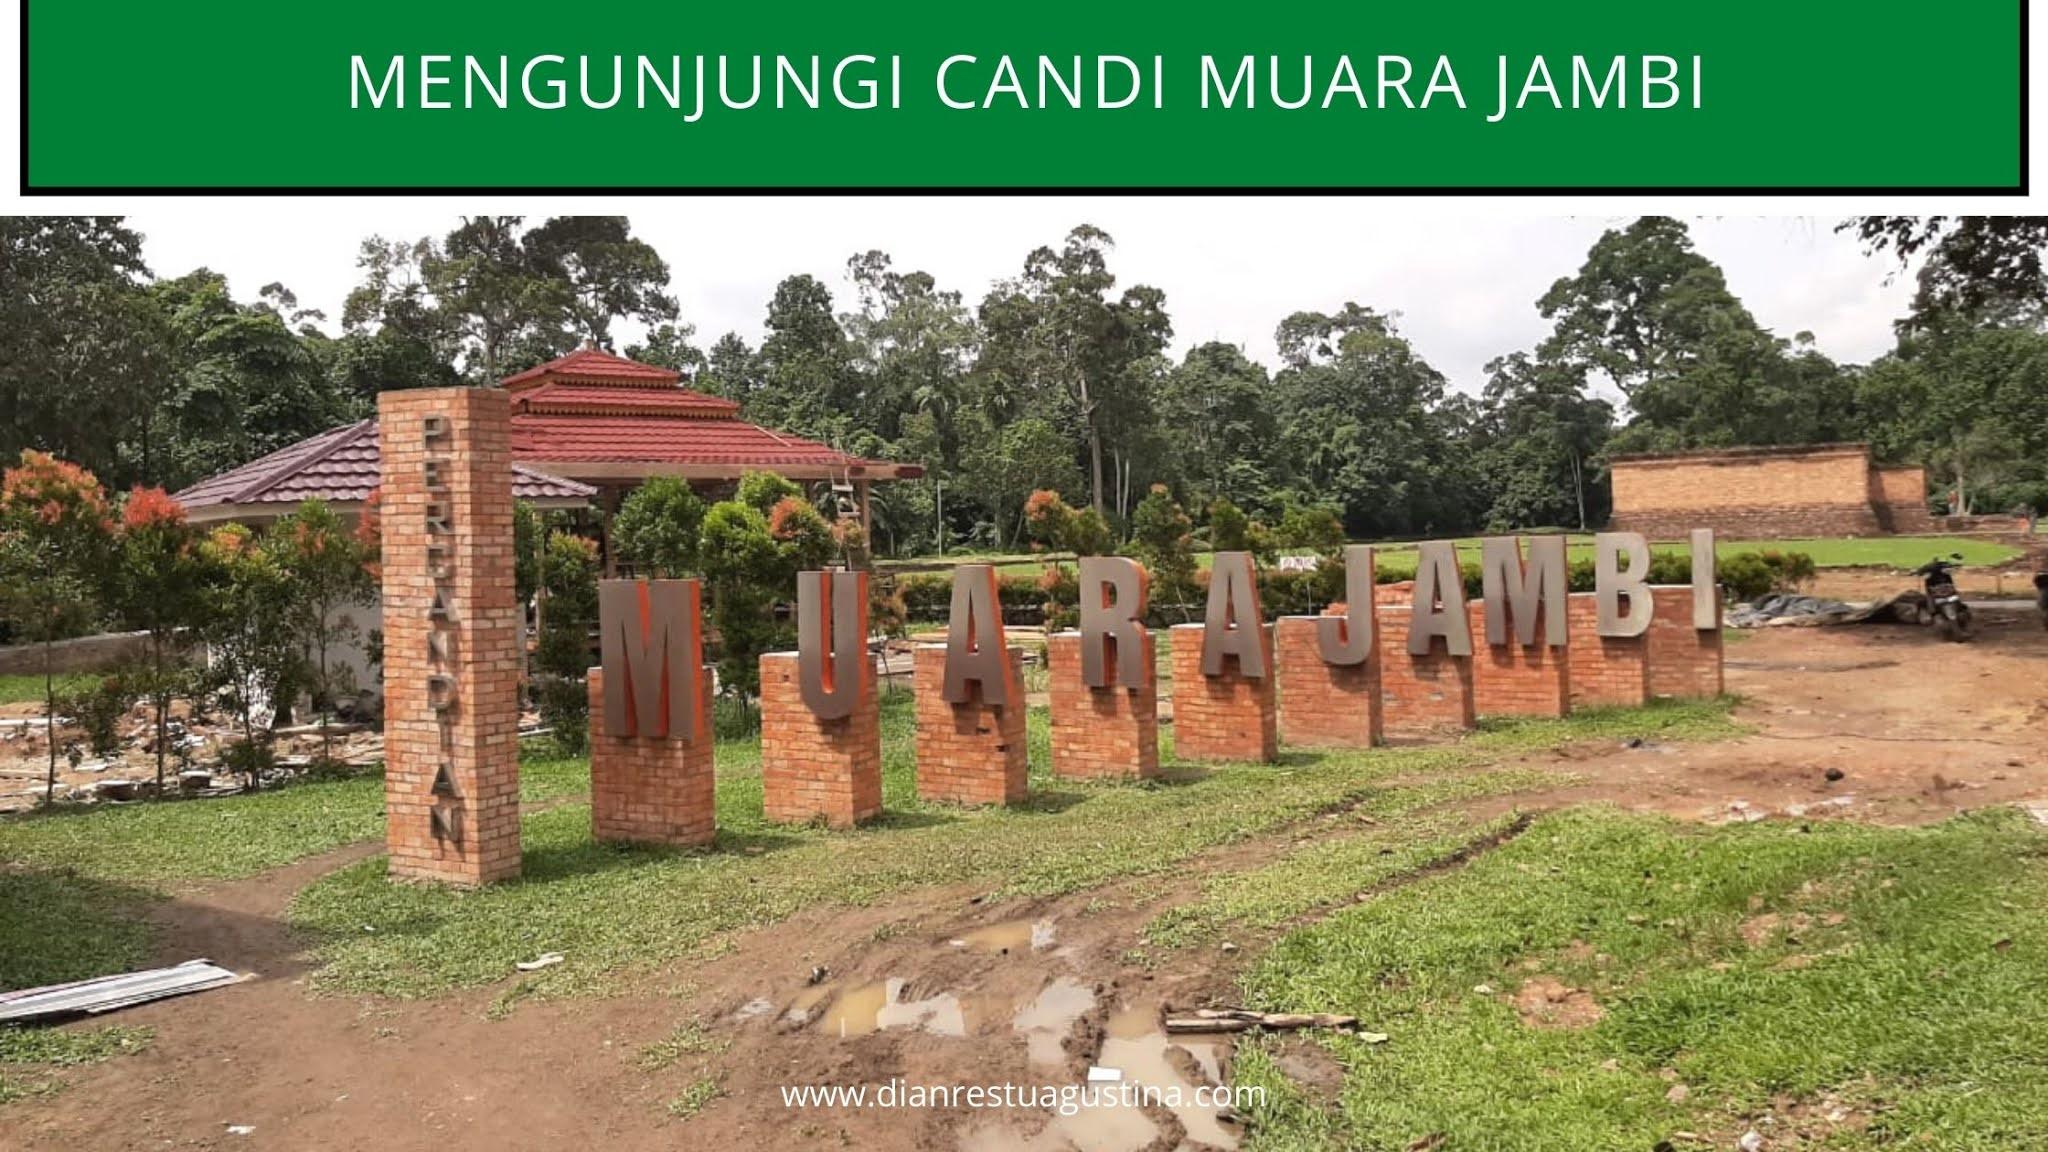 Candi Muara Jambi